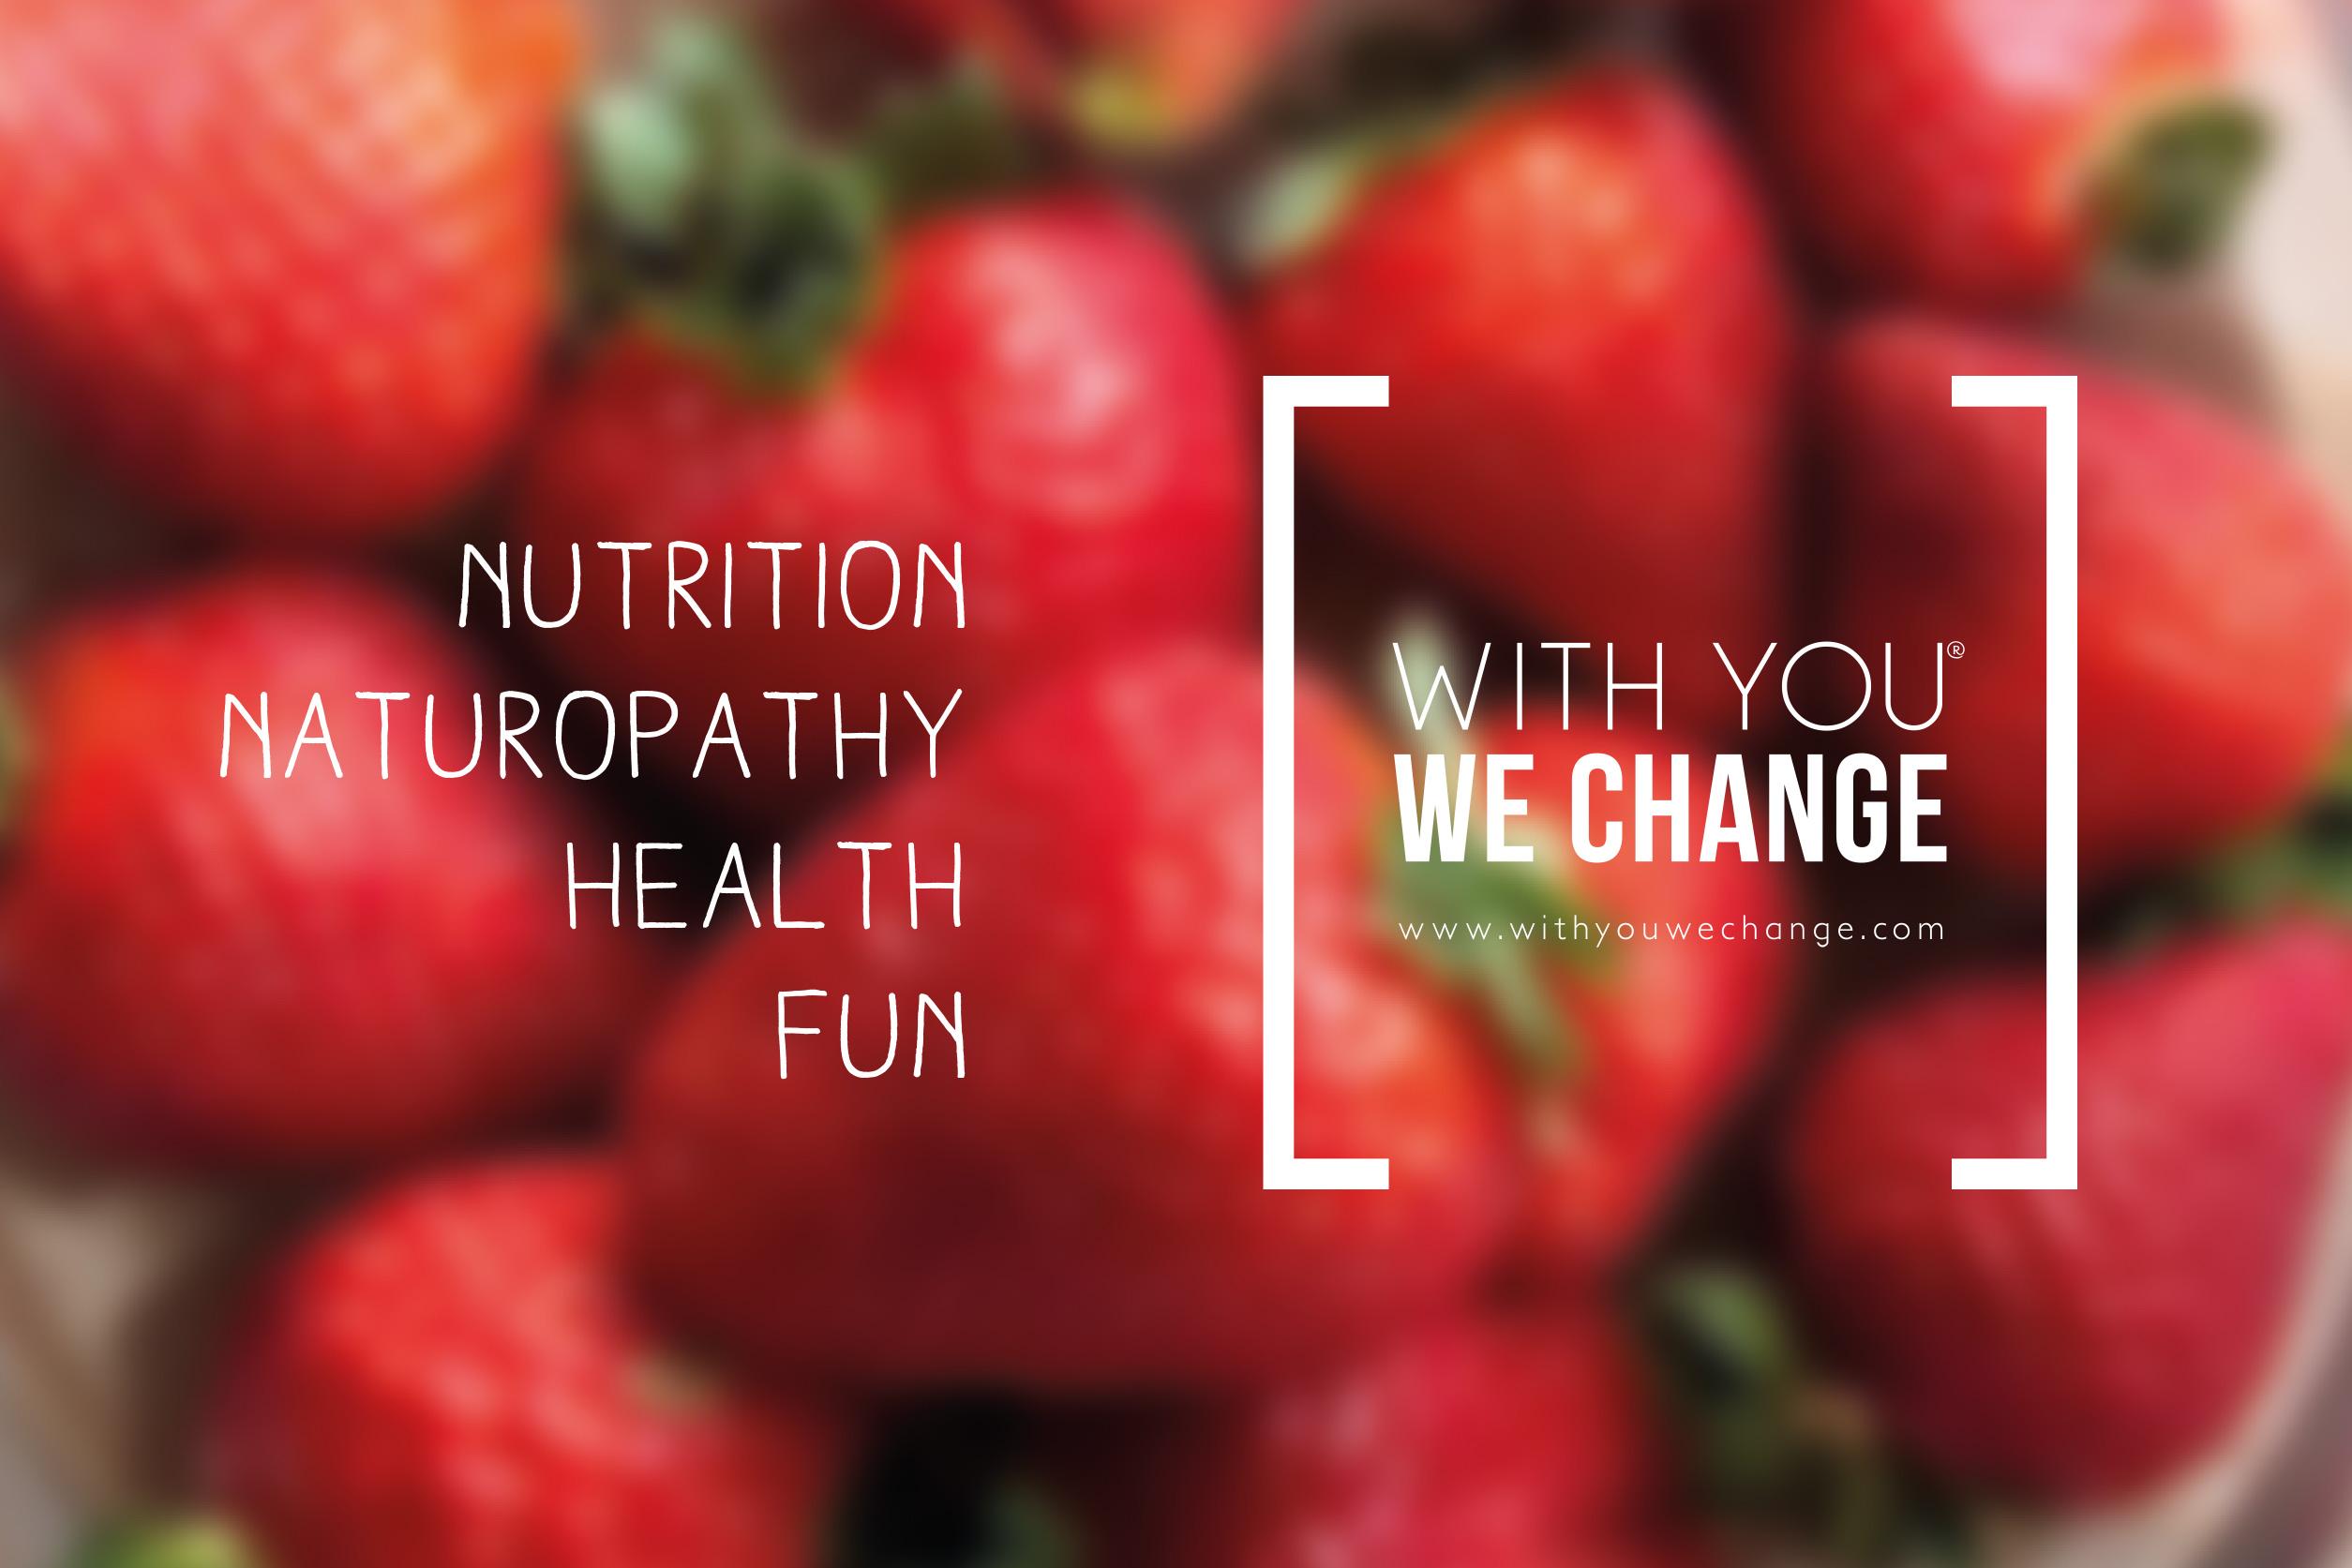 with-you-we-change-2